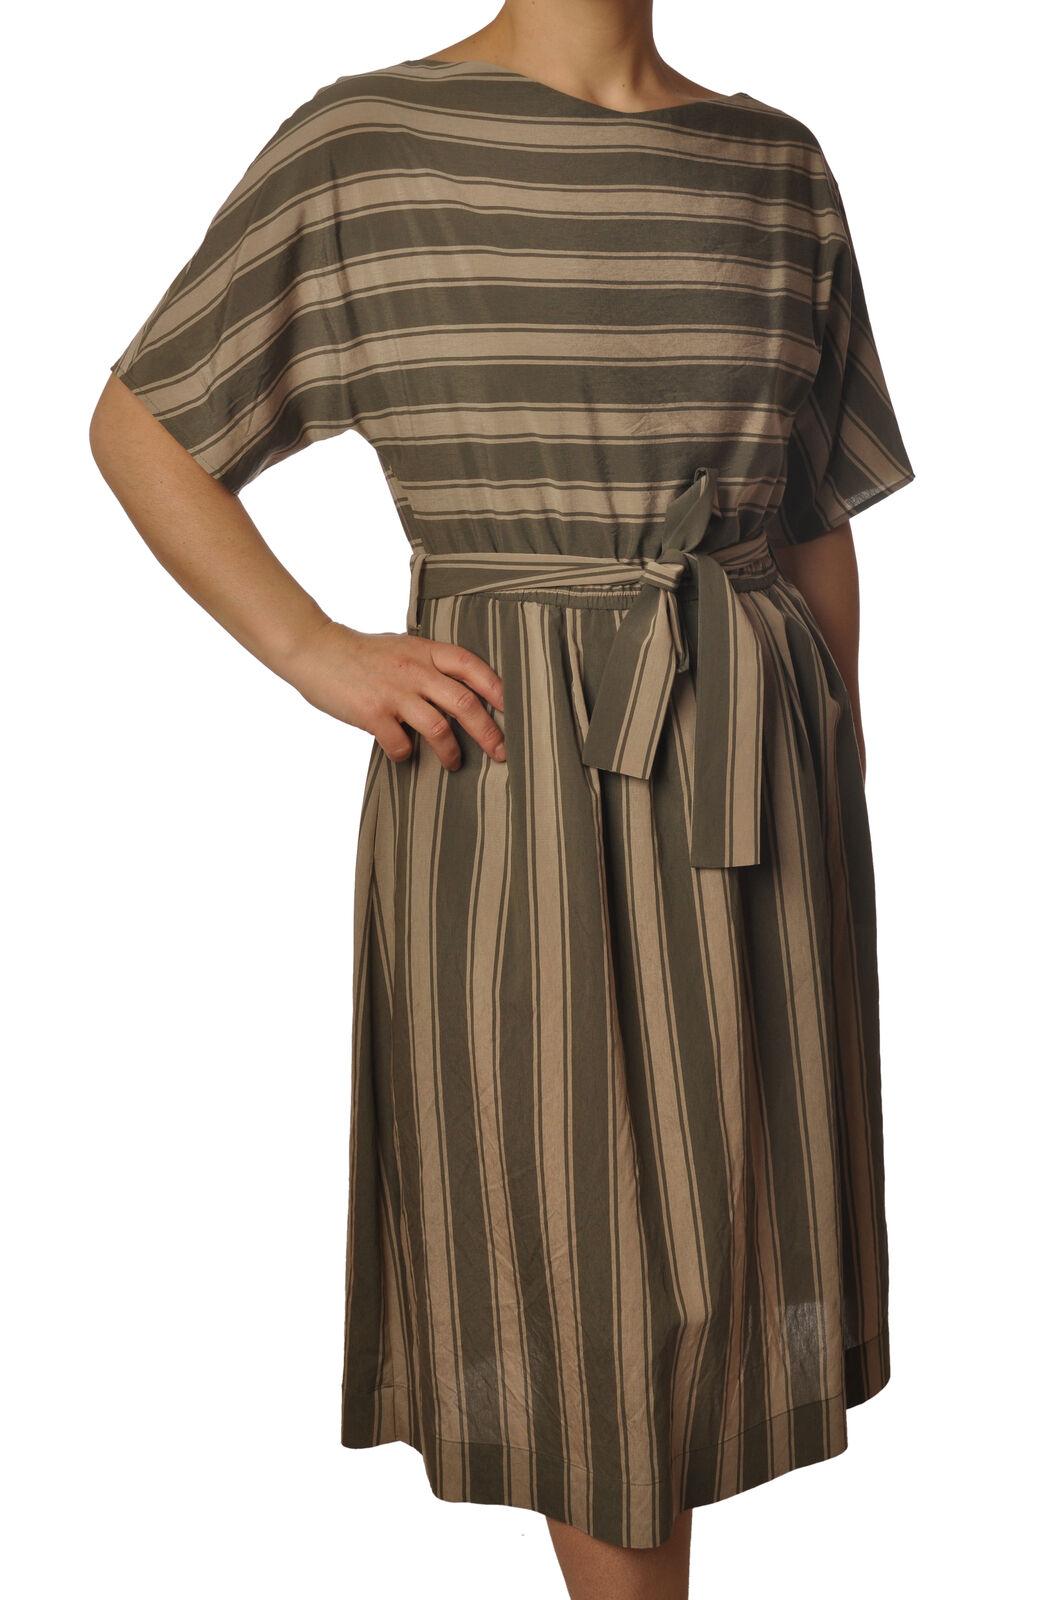 Woolrich - Kleider-Kleid - Frau - Fantasie - 6249905D191008